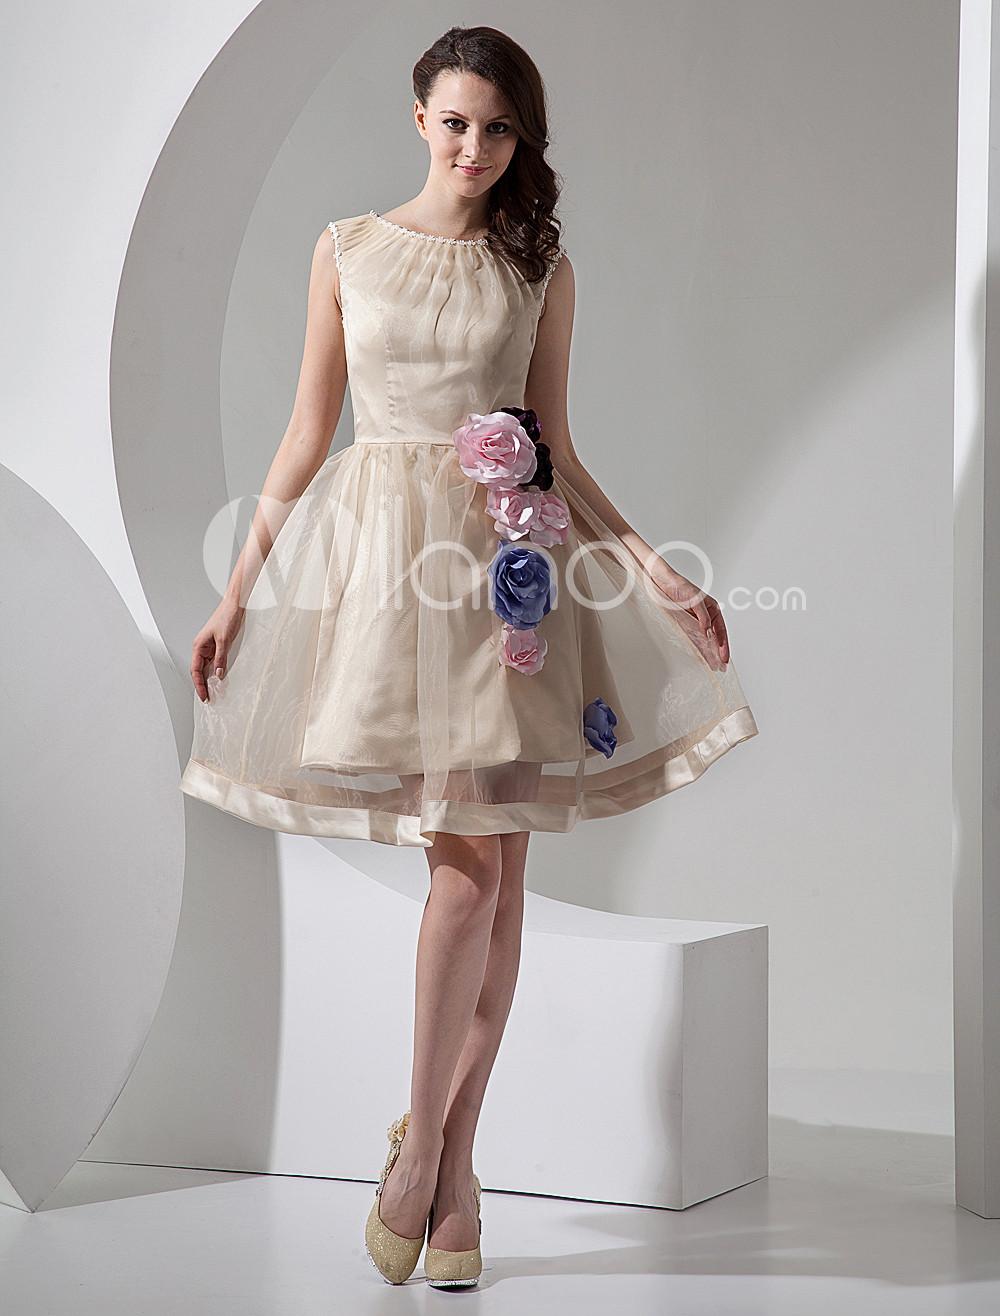 short wedding dresses champagne color champagne colored wedding dress Short Wedding Dresses Champagne Color 20